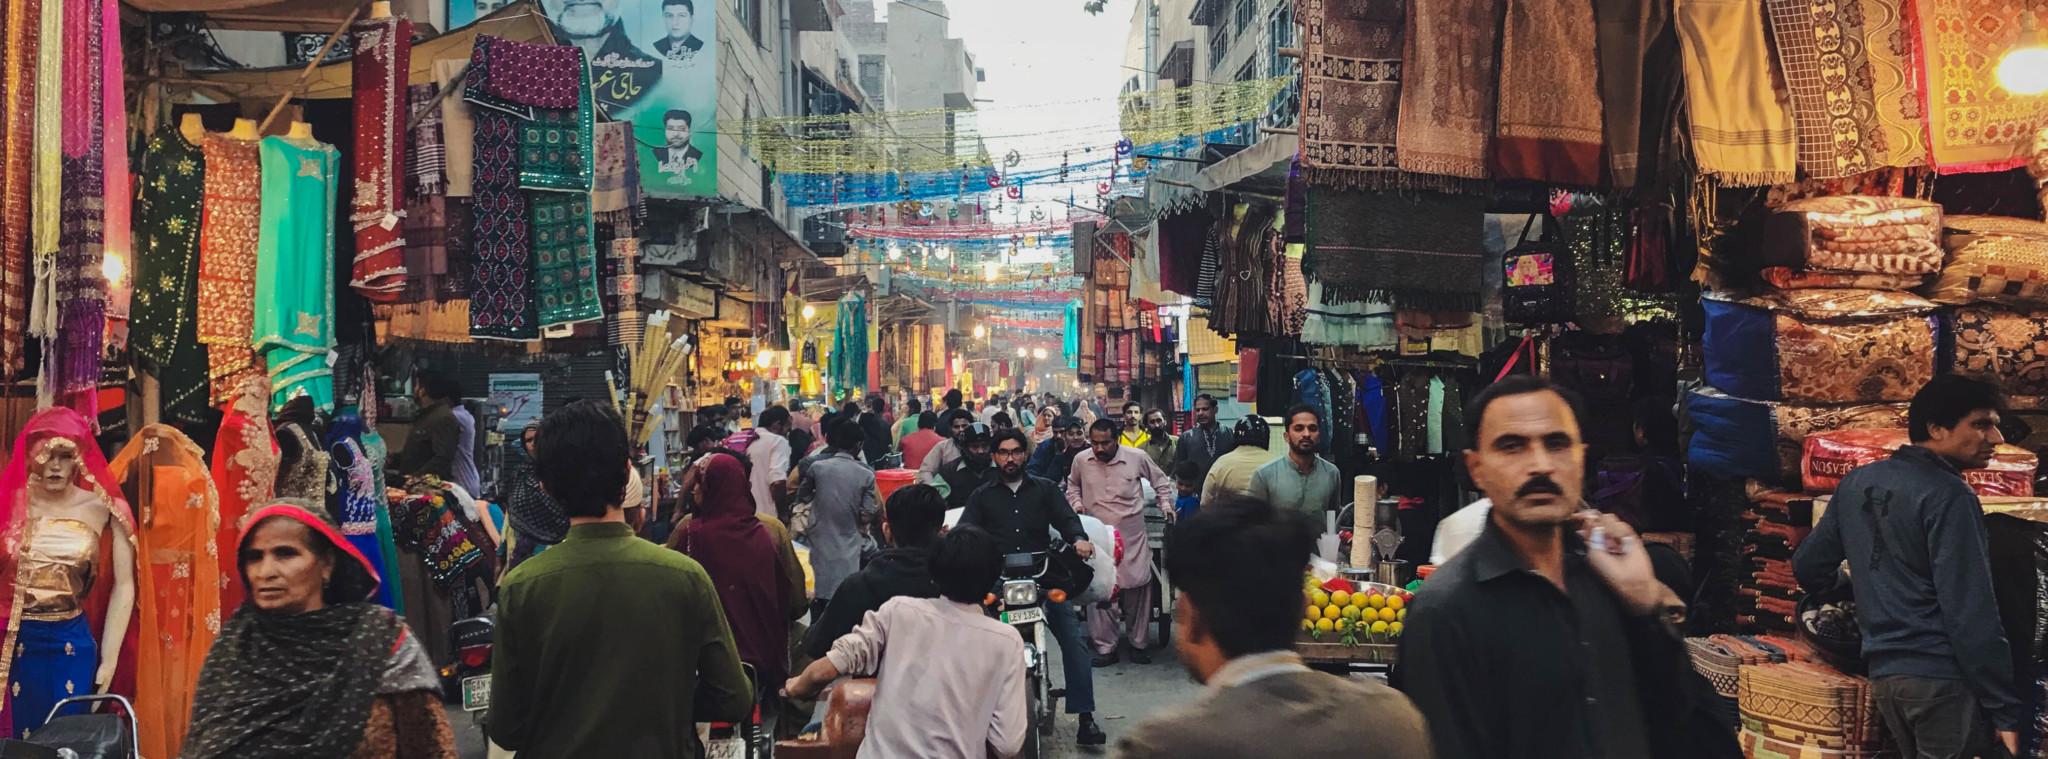 Pakistan Urlaub